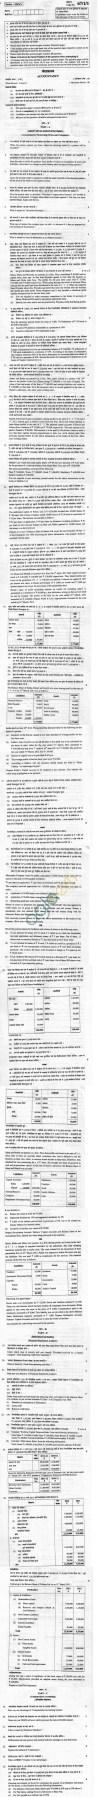 CBSE Board Exam 2013 Class XII Question Paper -Accountancy